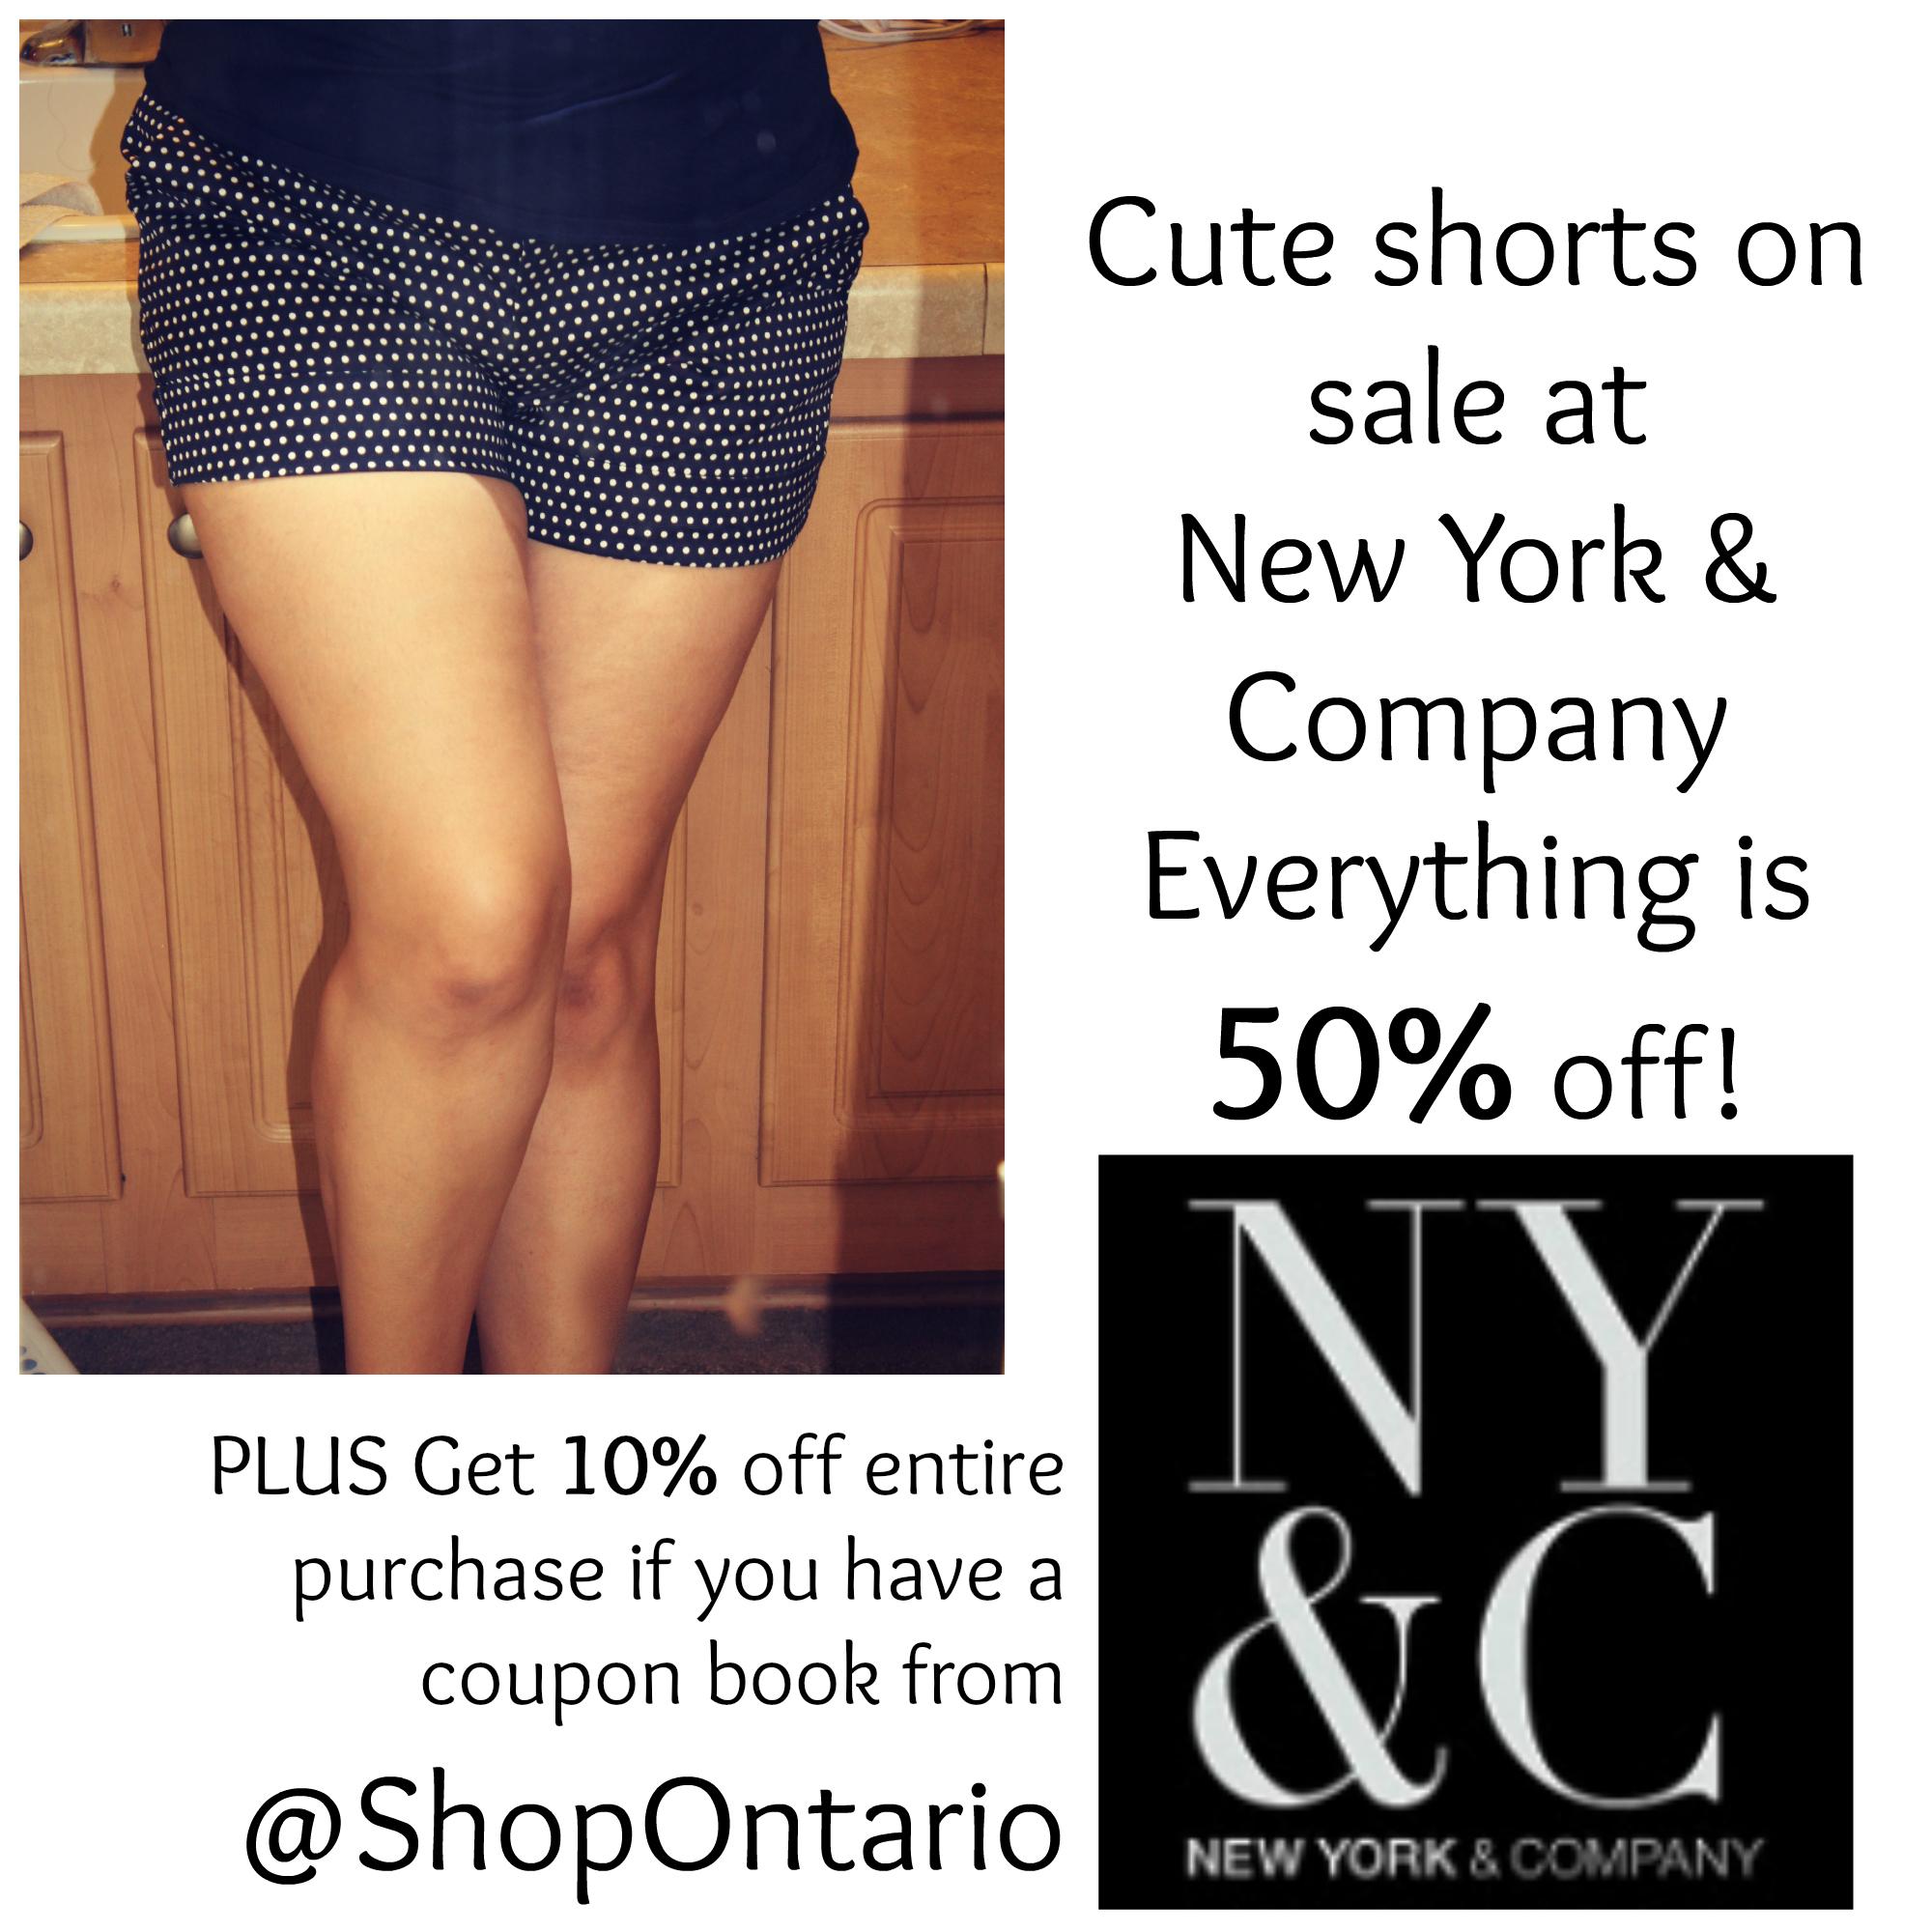 New York and Company Ontario Mills Instagram 01.jpg